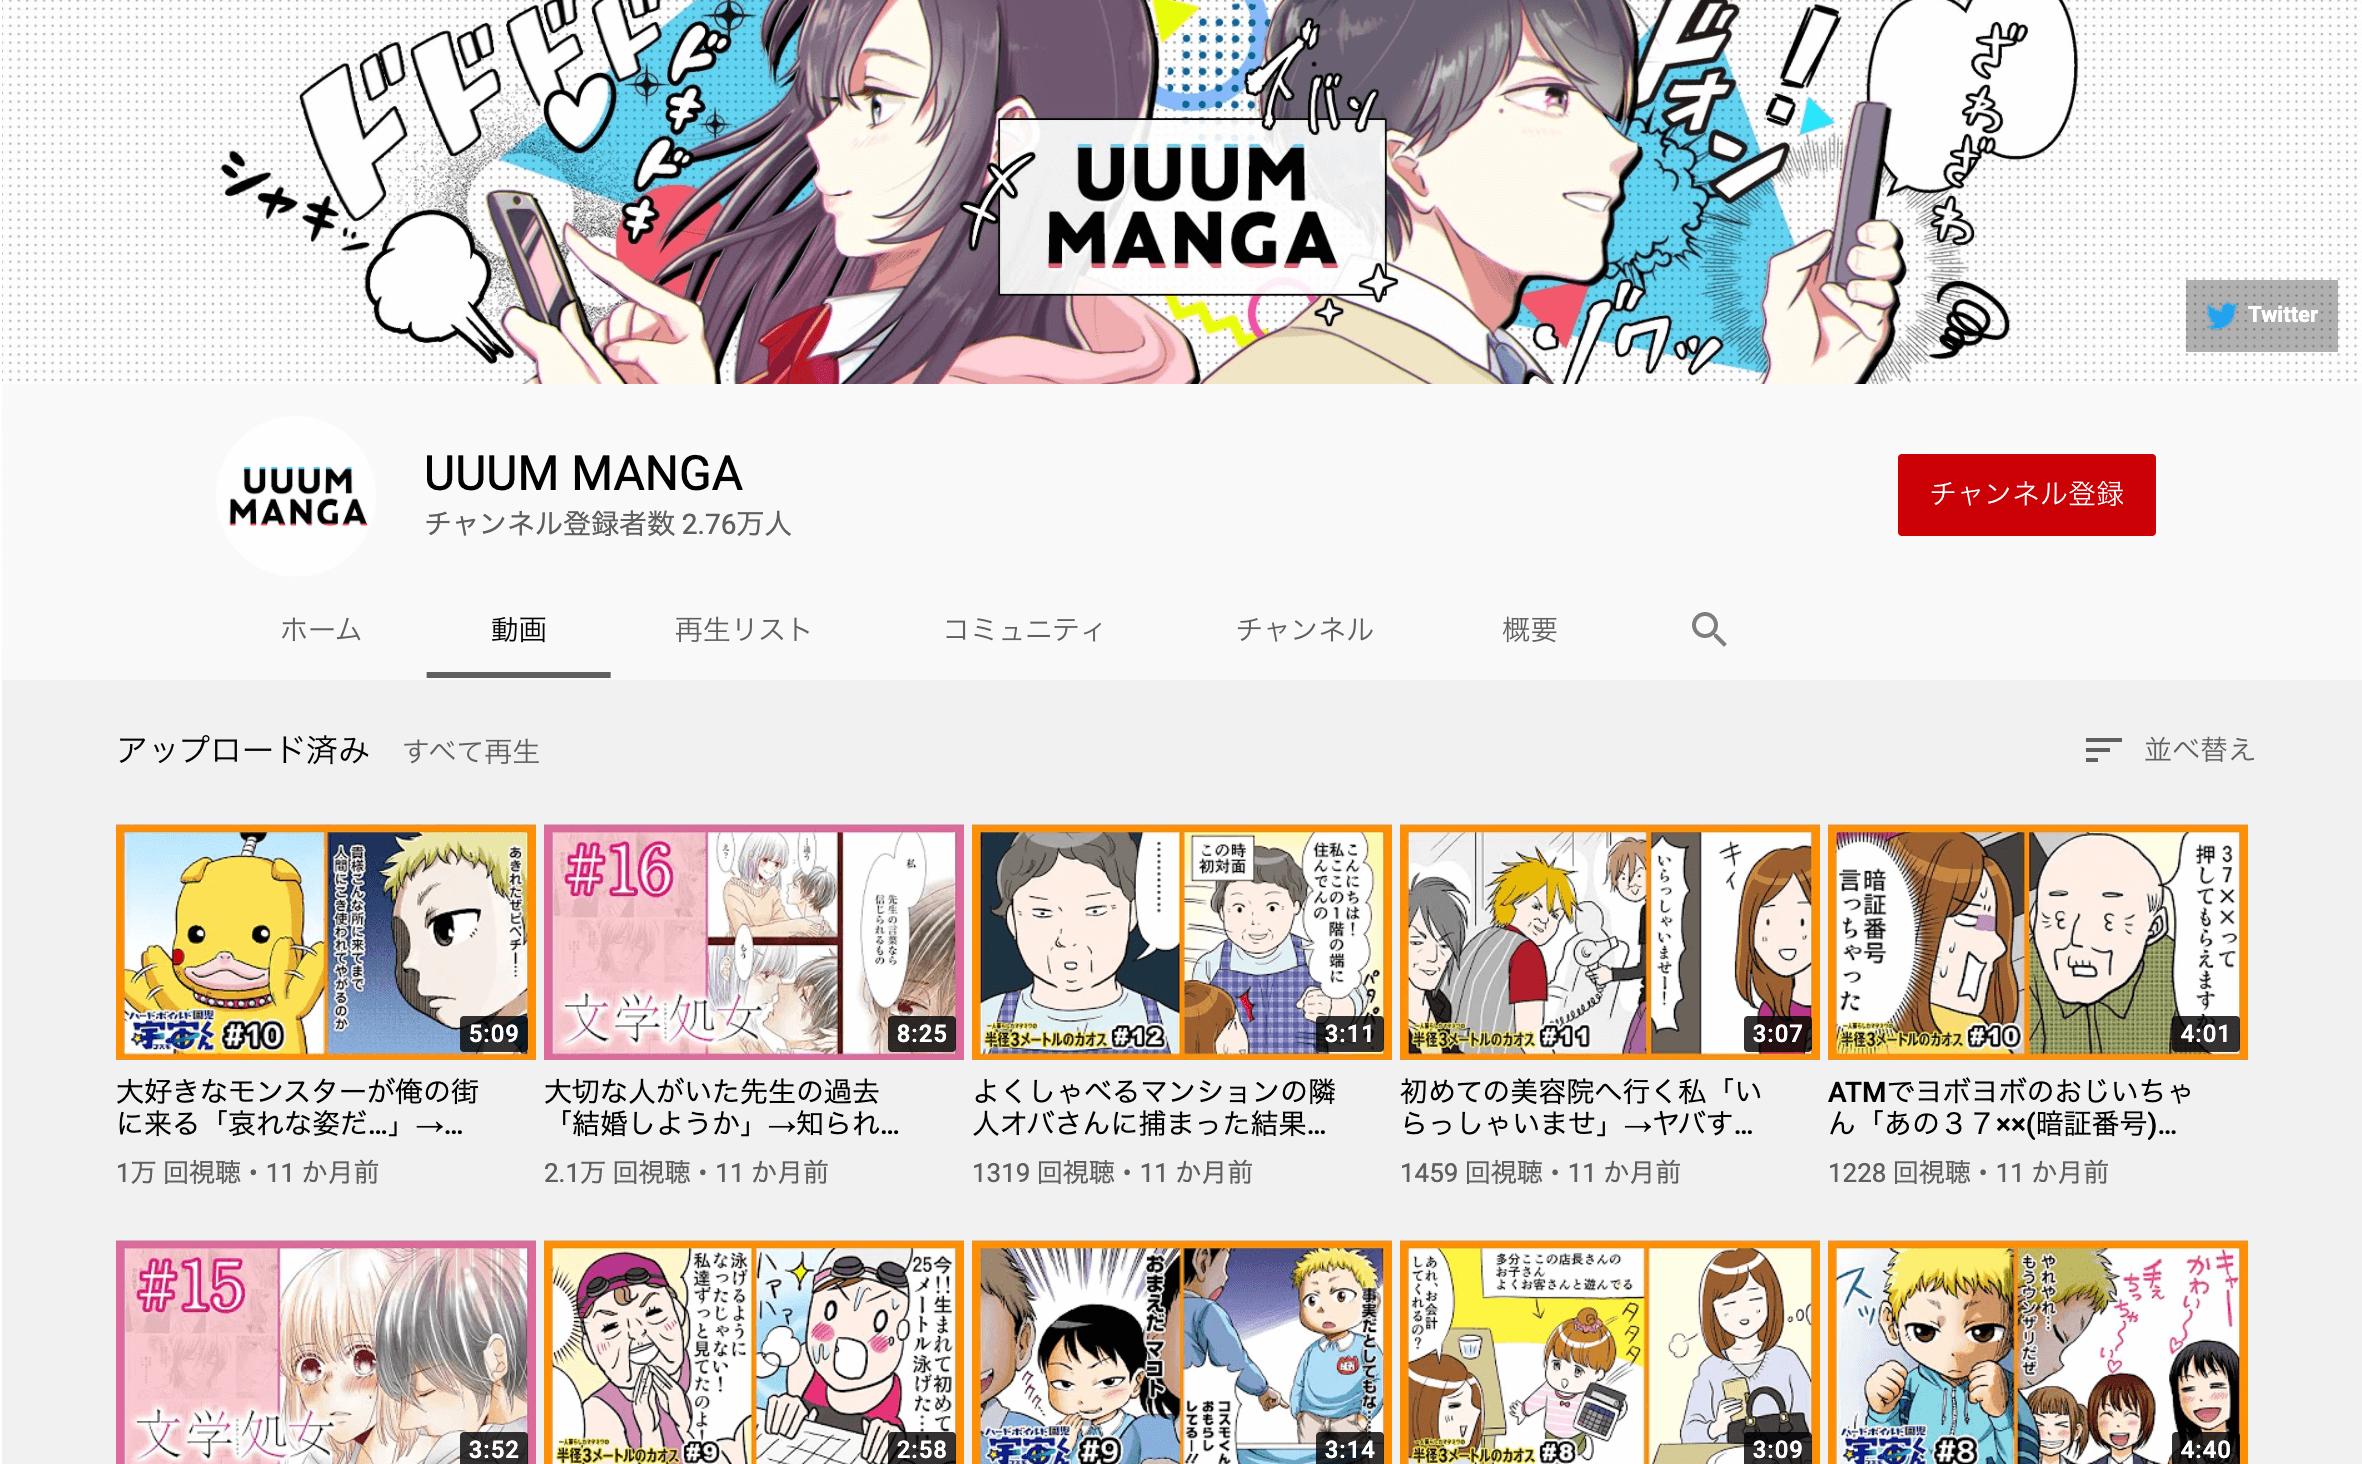 youtube_manga_uuummanga